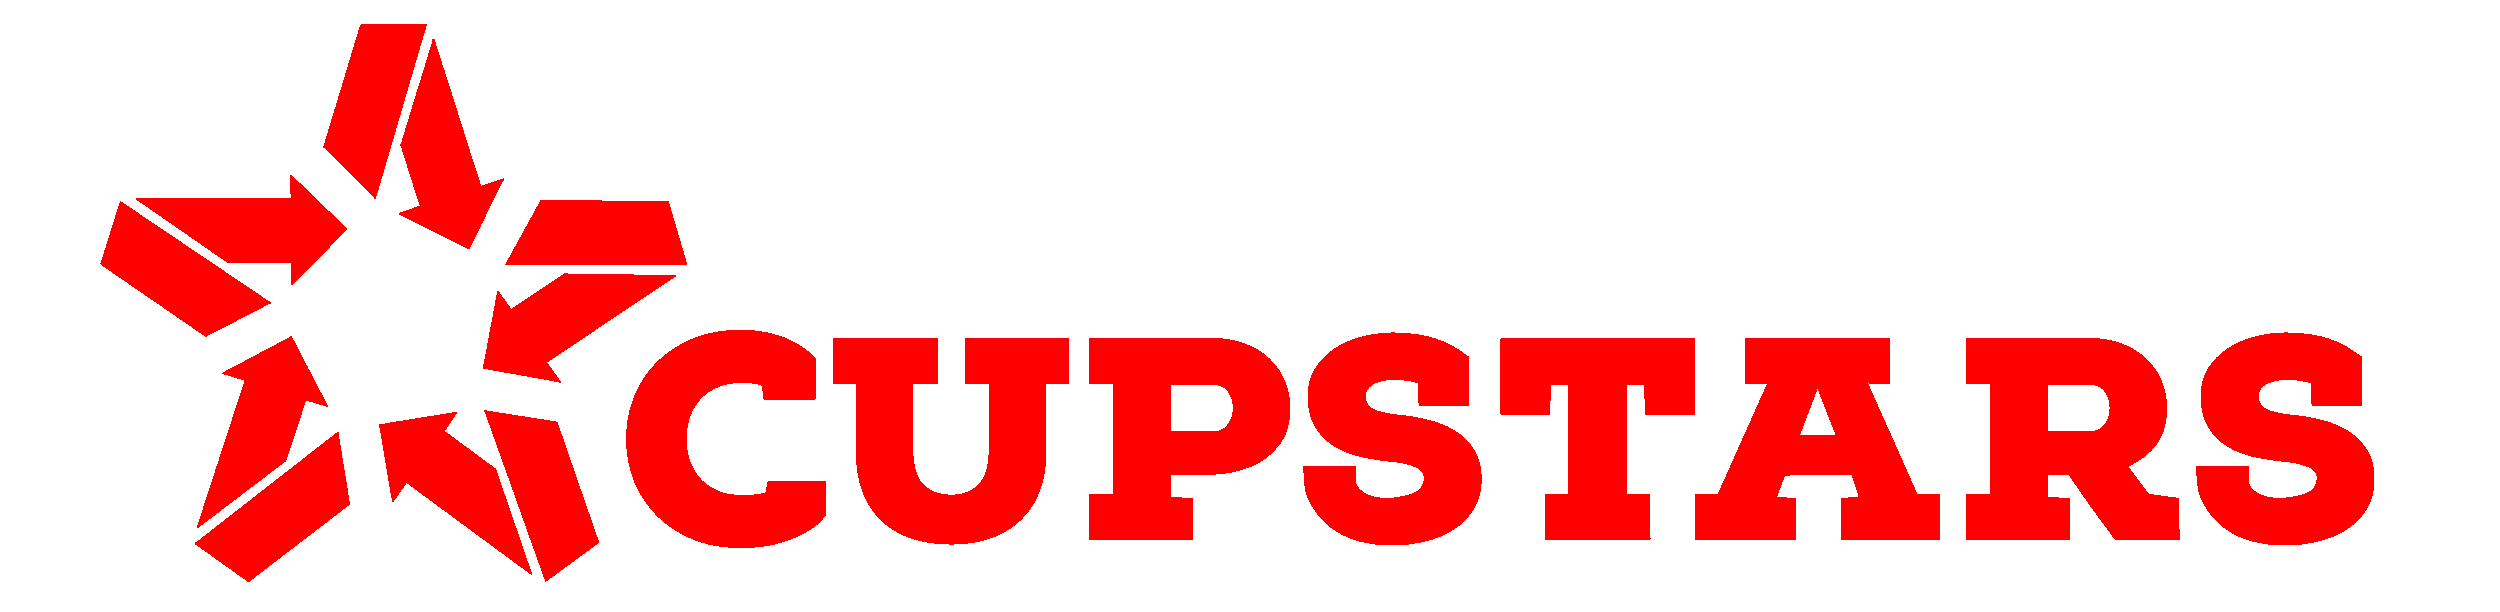 Cupstars-logo.png